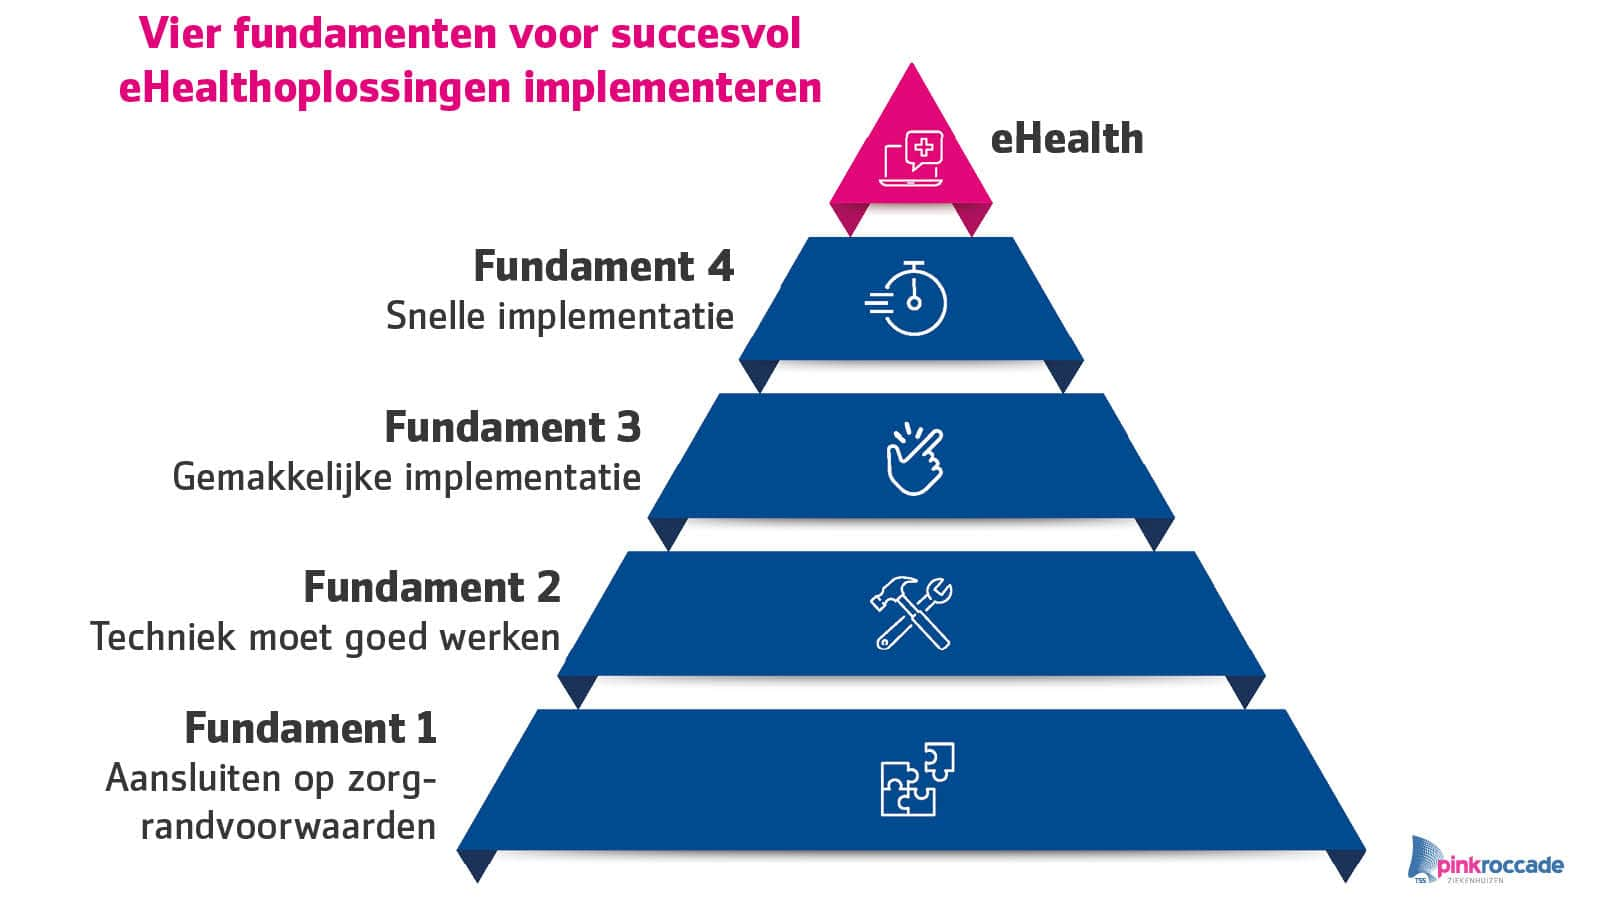 eHealth fundamenten piramide PinkRoccade Ziekenhuizen